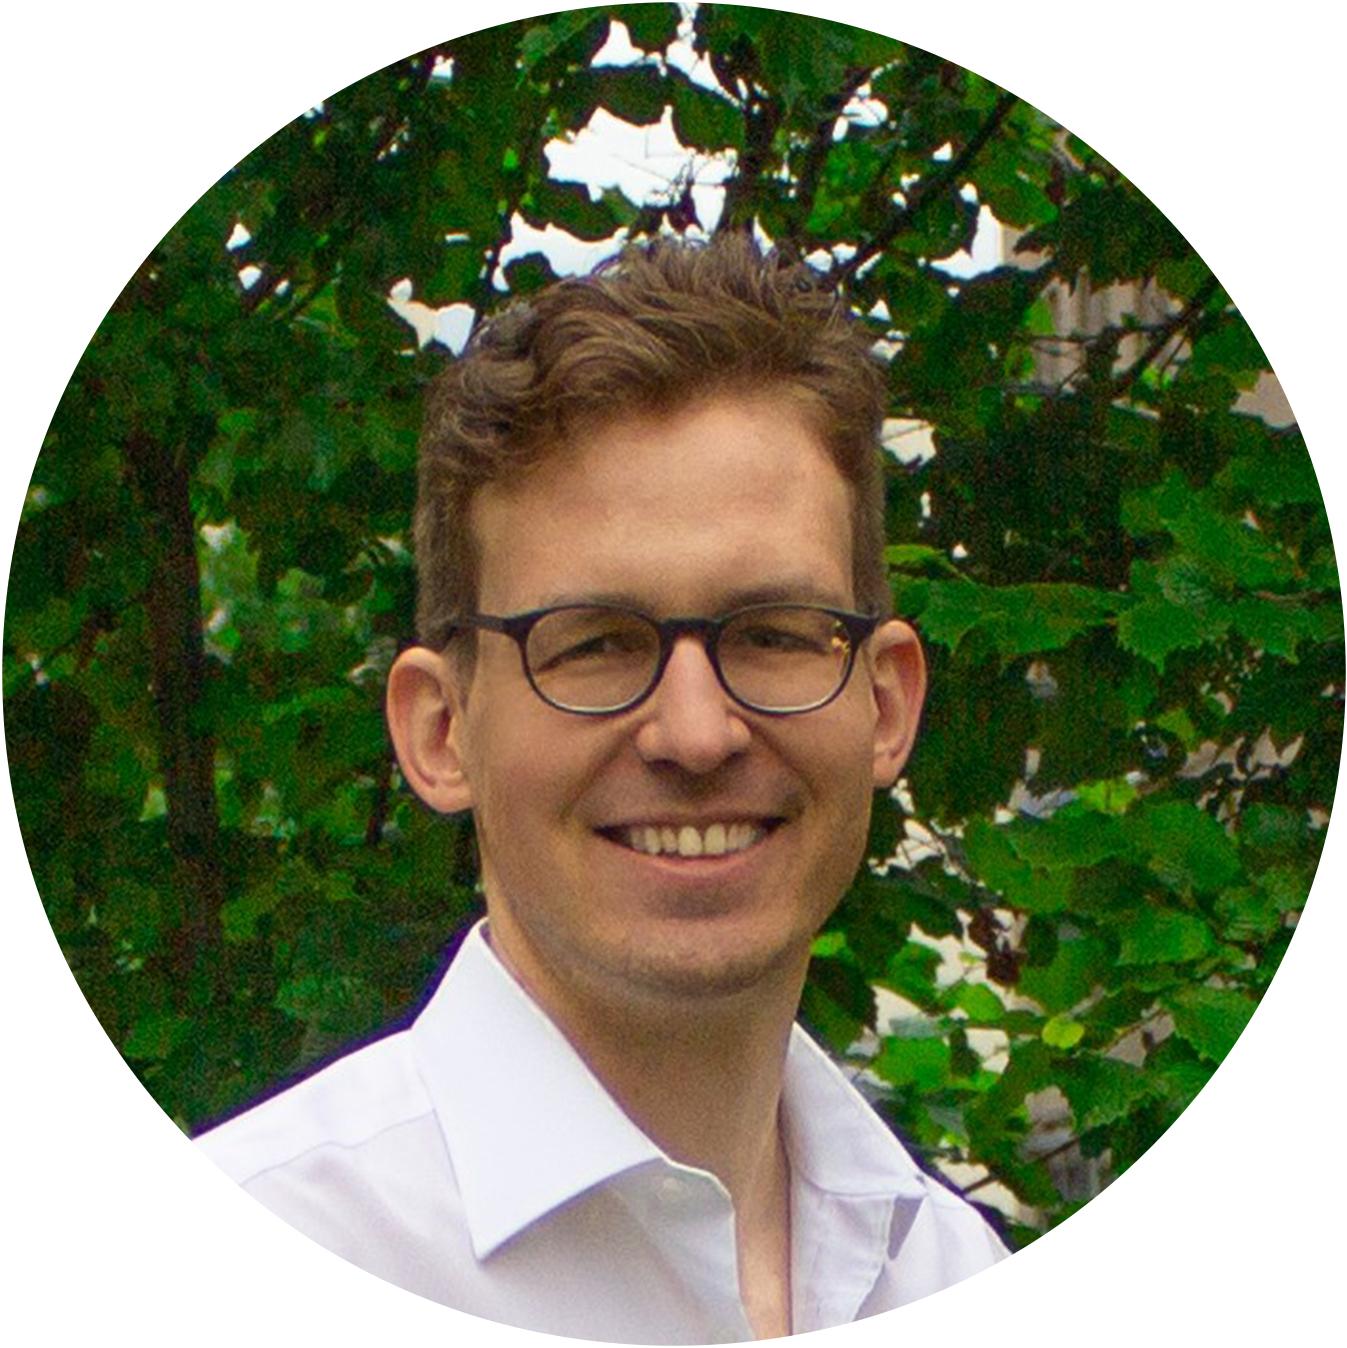 Samuel Müller WeAct cofounder profile picture